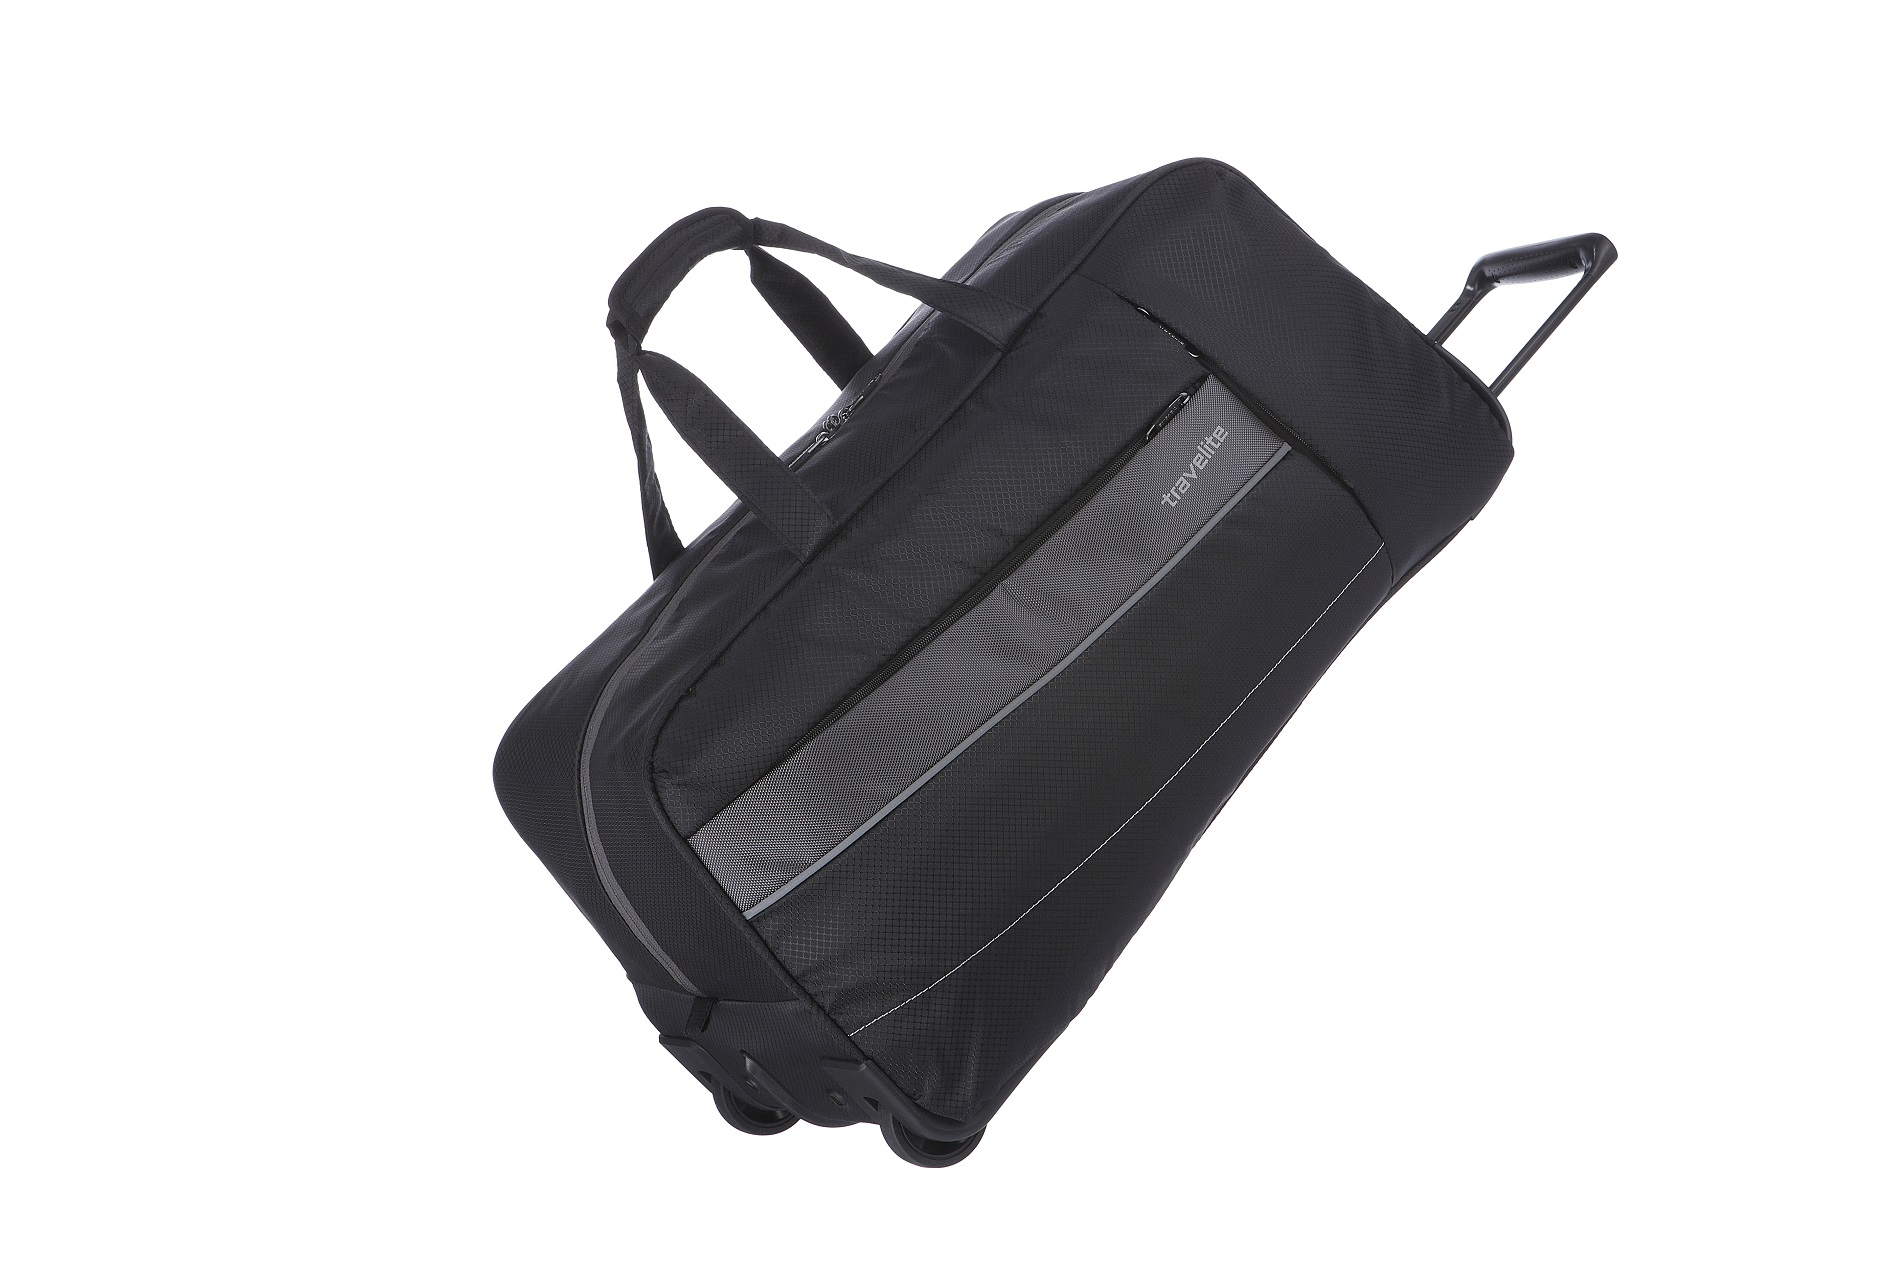 Travelite Kite 2w Travel Bag Black